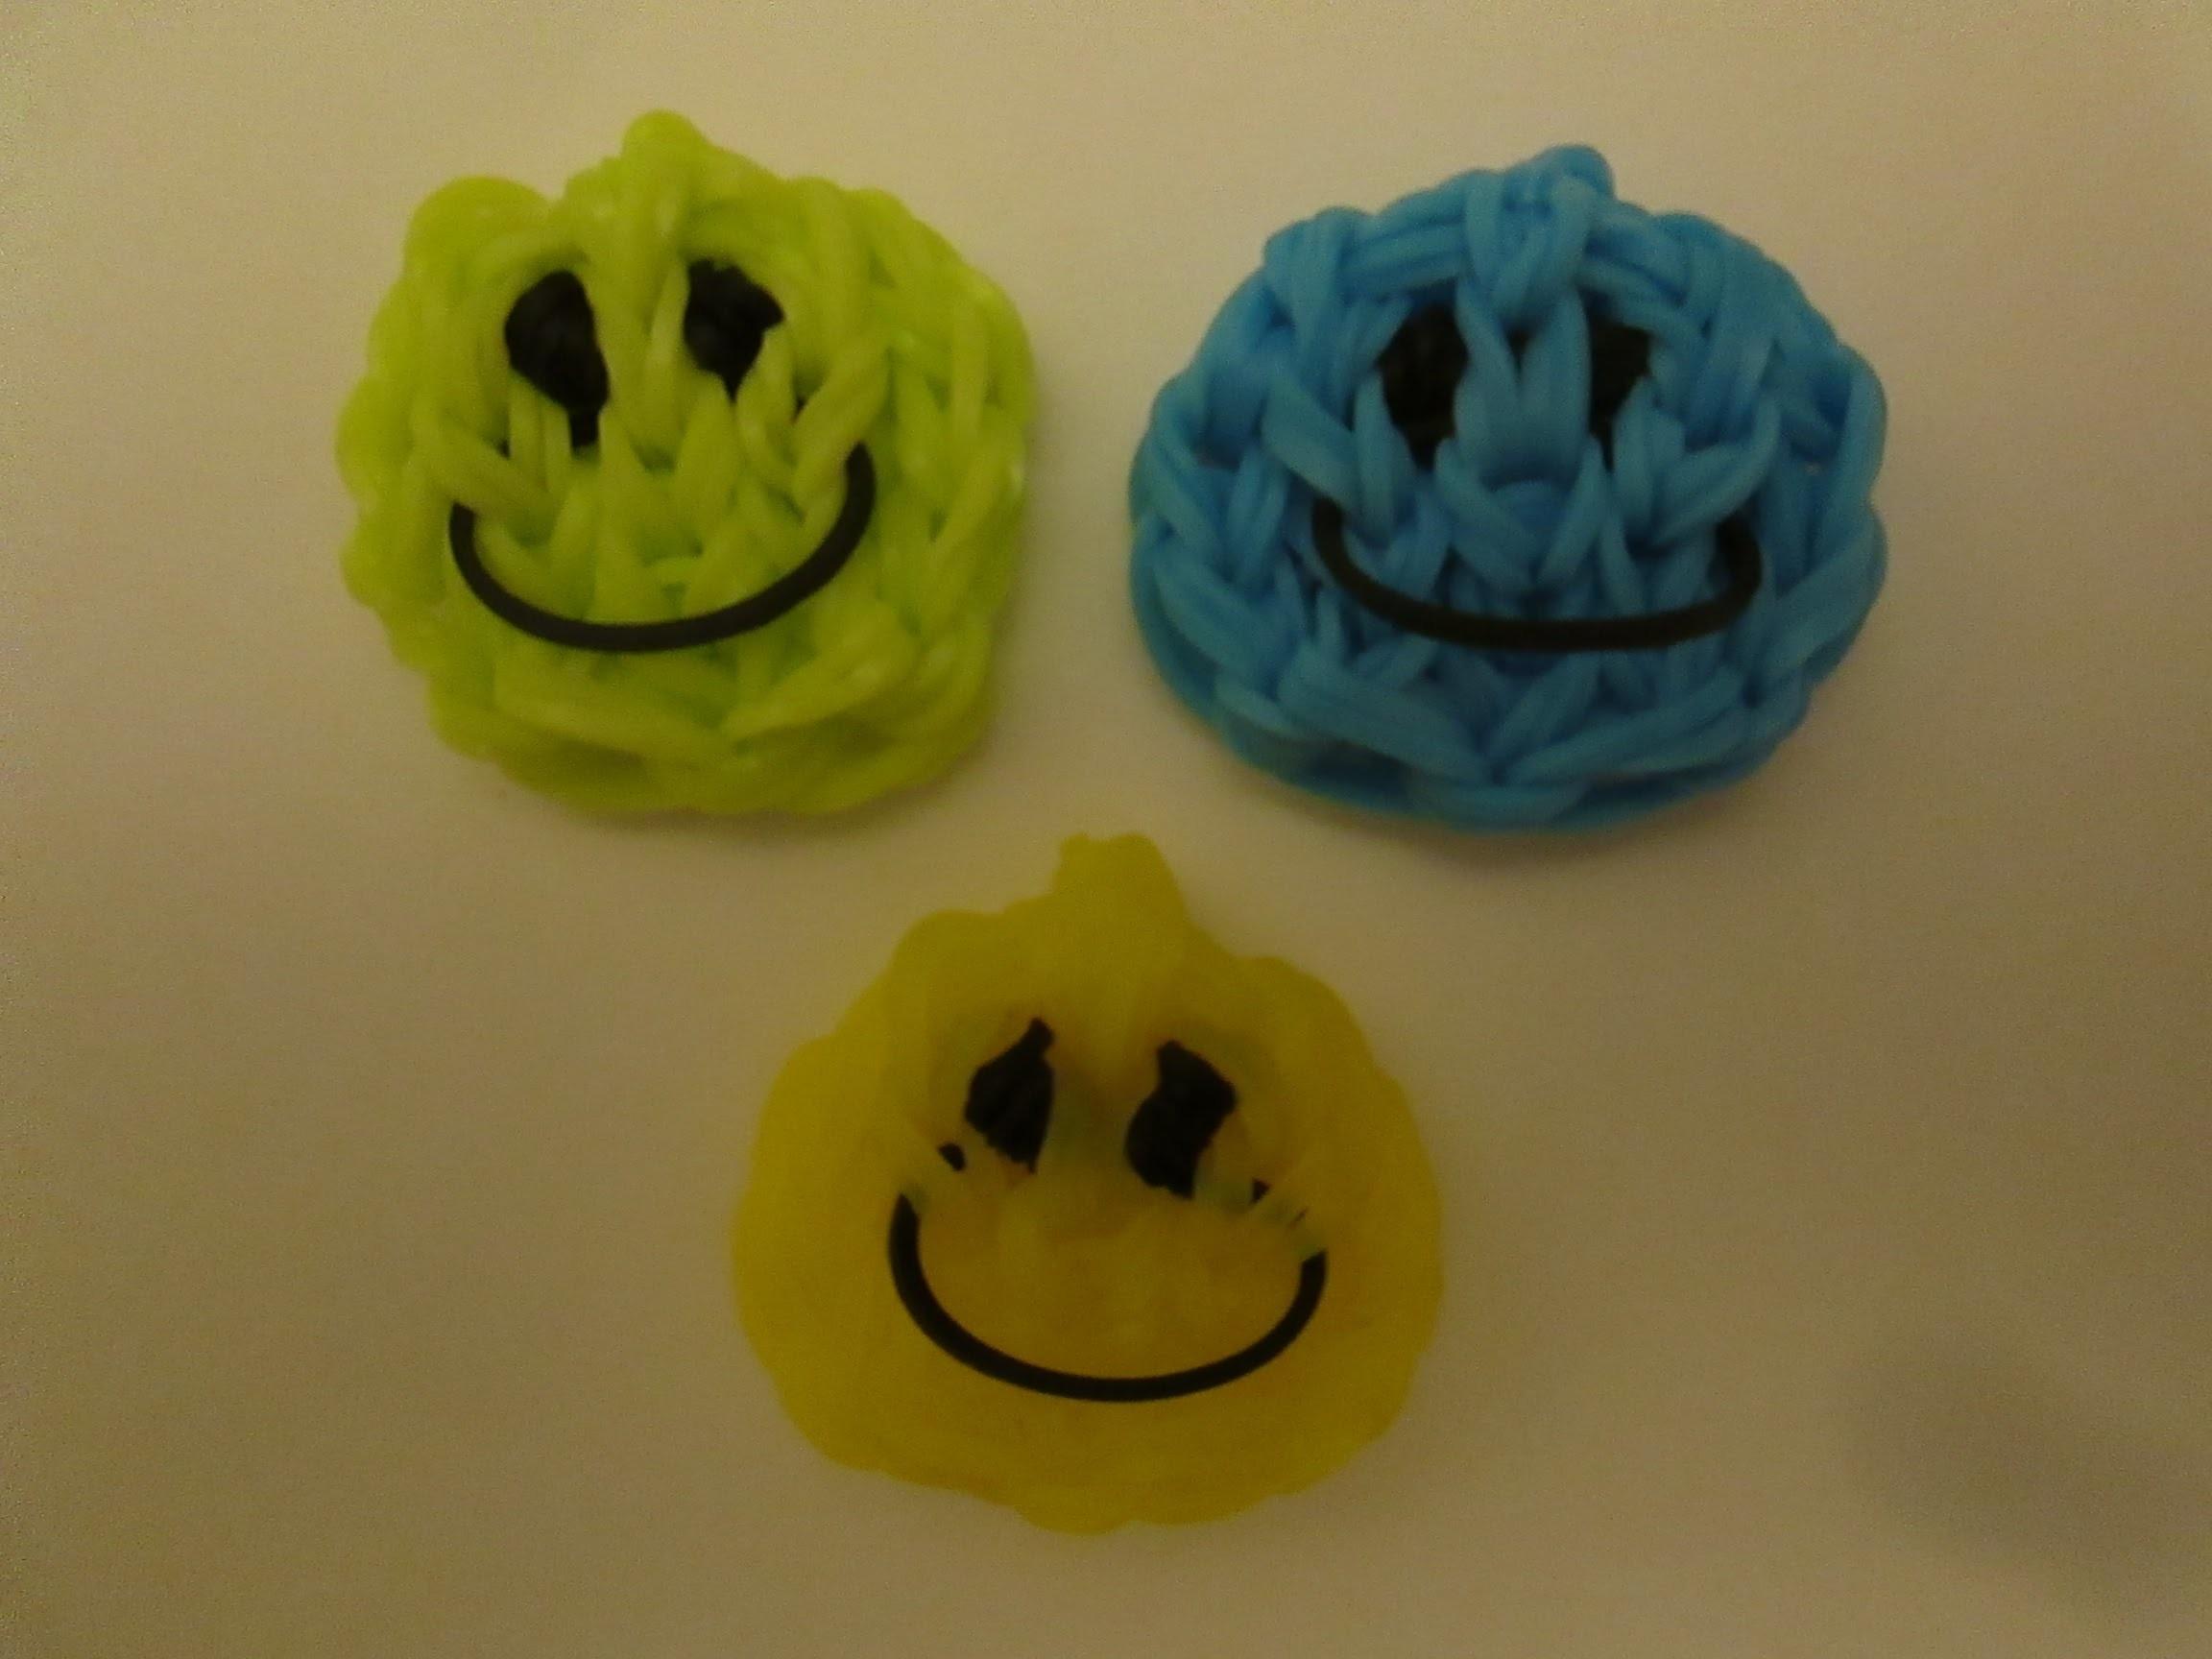 Rainbow Loom Happy Face and Smiley Face Charm. Easy